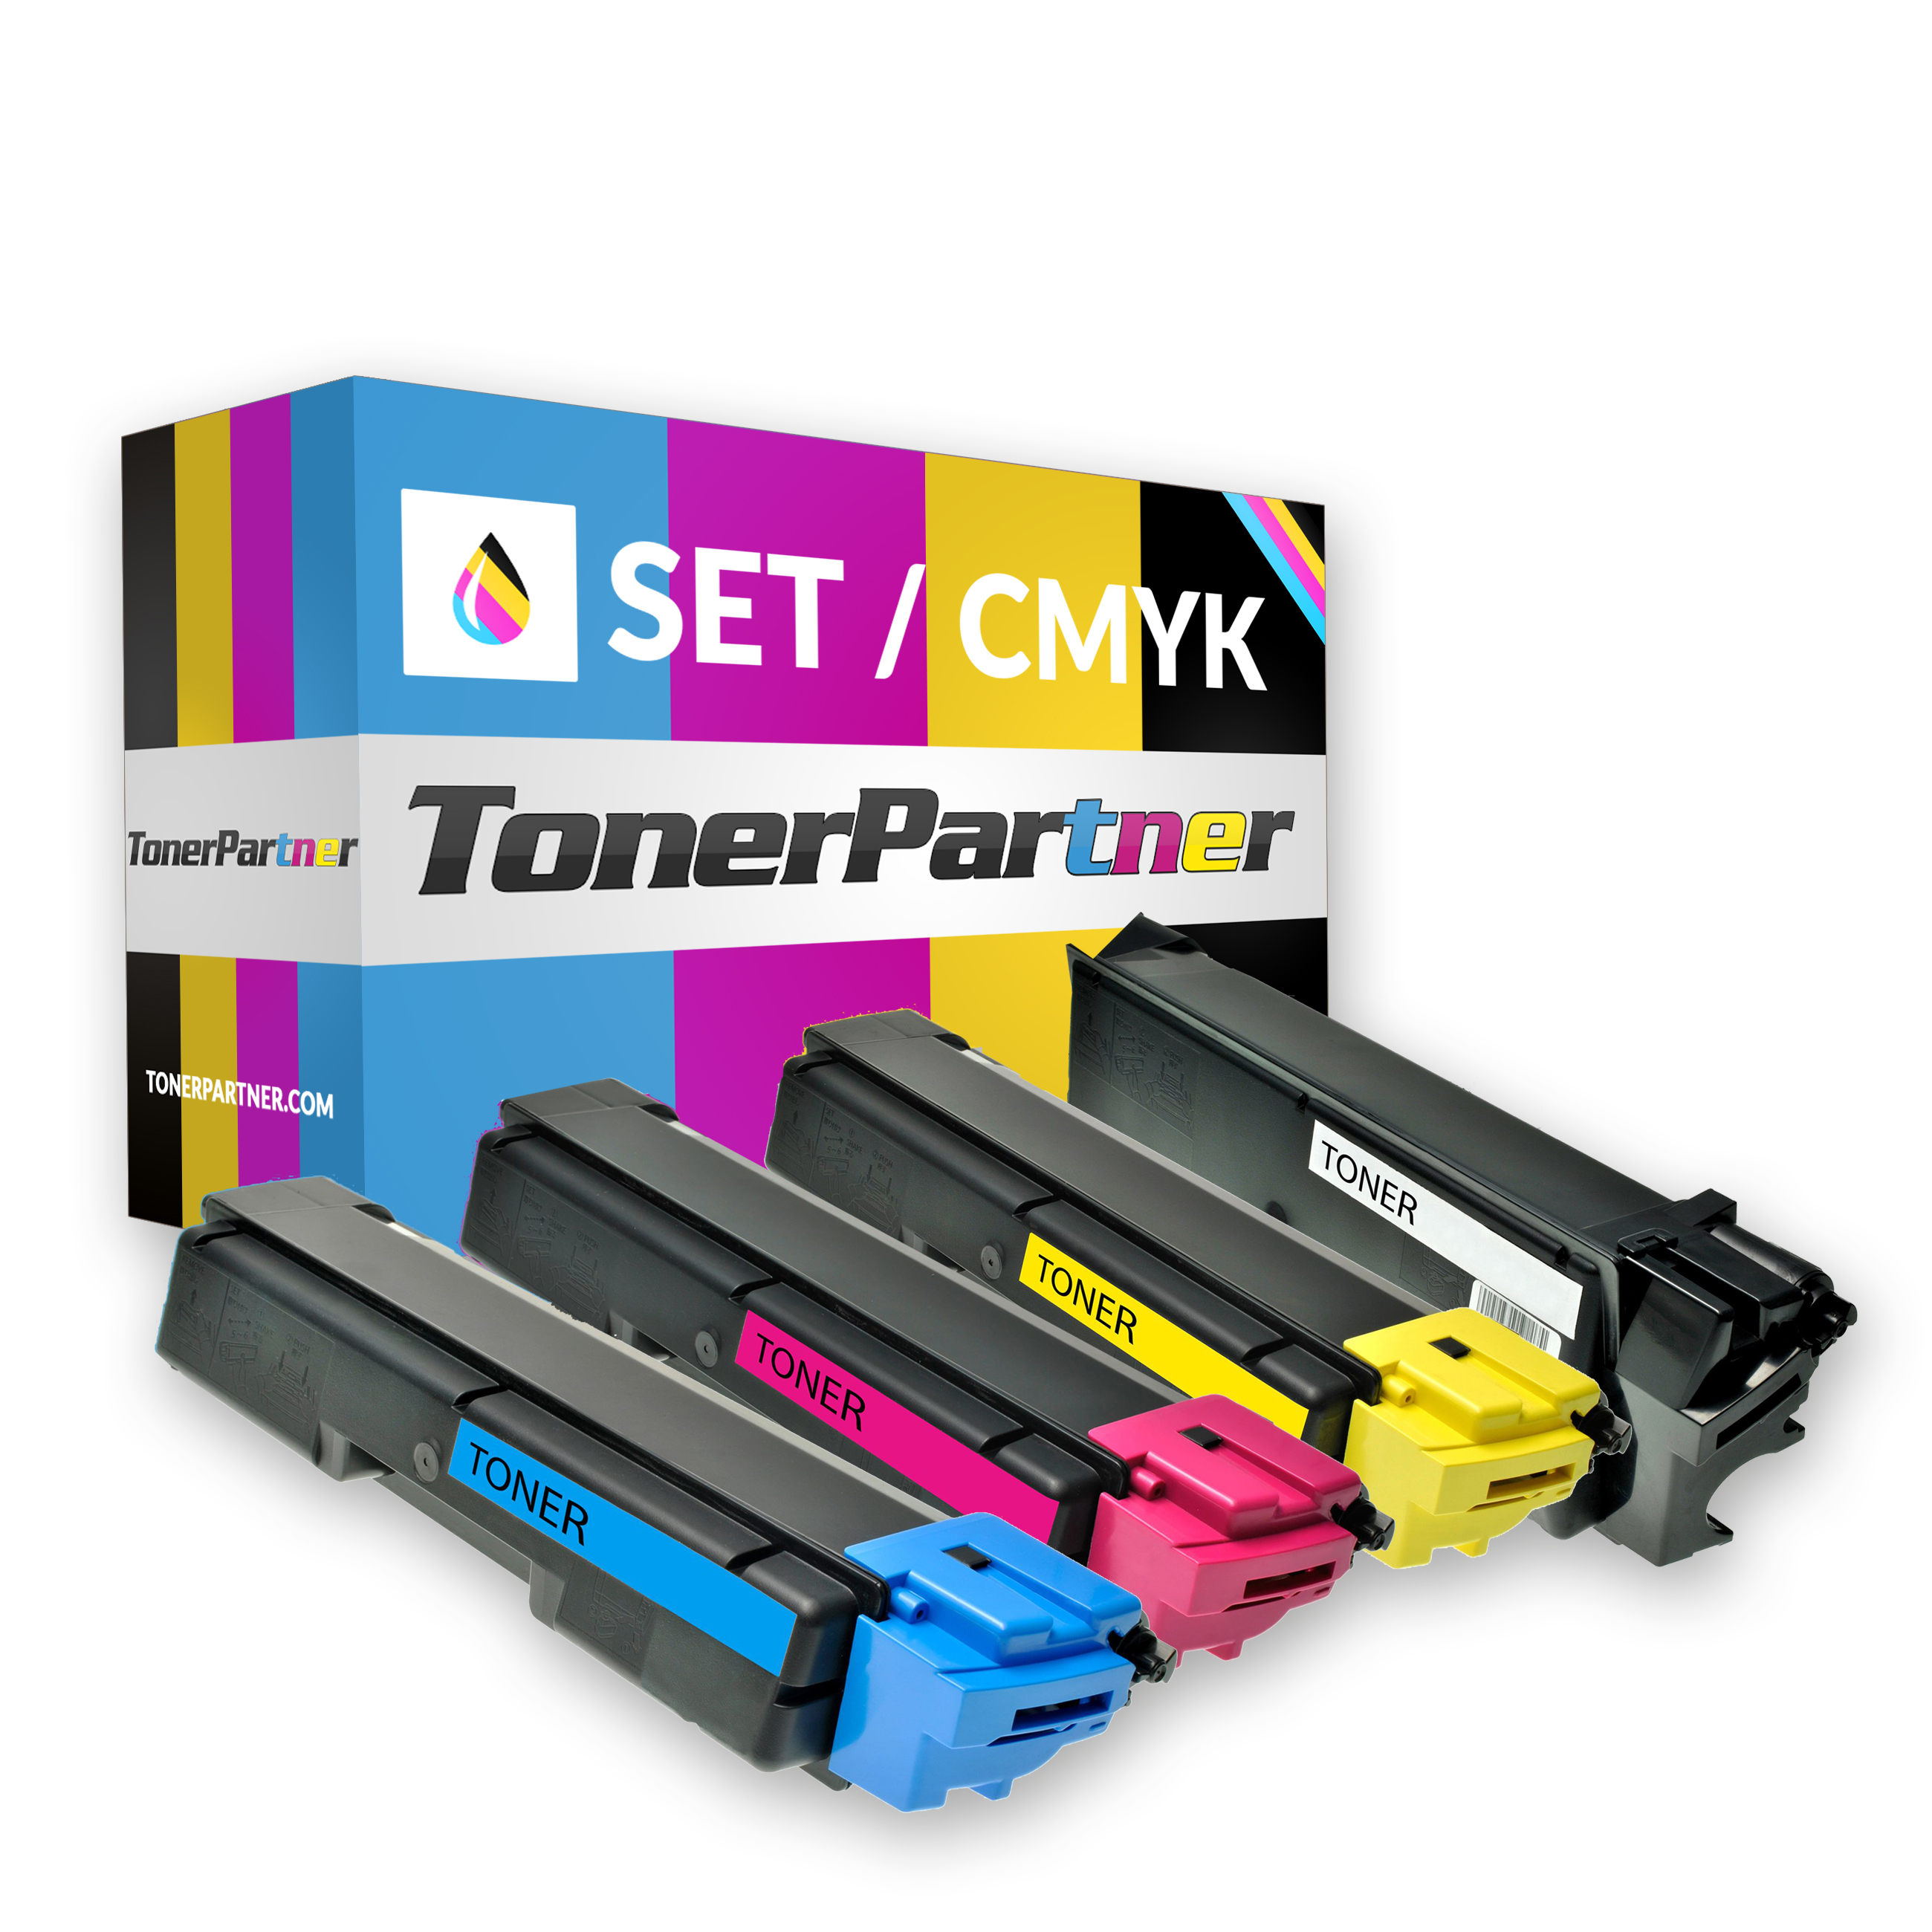 Kyocera/Mita TK-590 K (1x 7.000 Seiten) TK-590 C/M/Y (3x 5.000 Seiten) Toner MultiPack Kompatibel